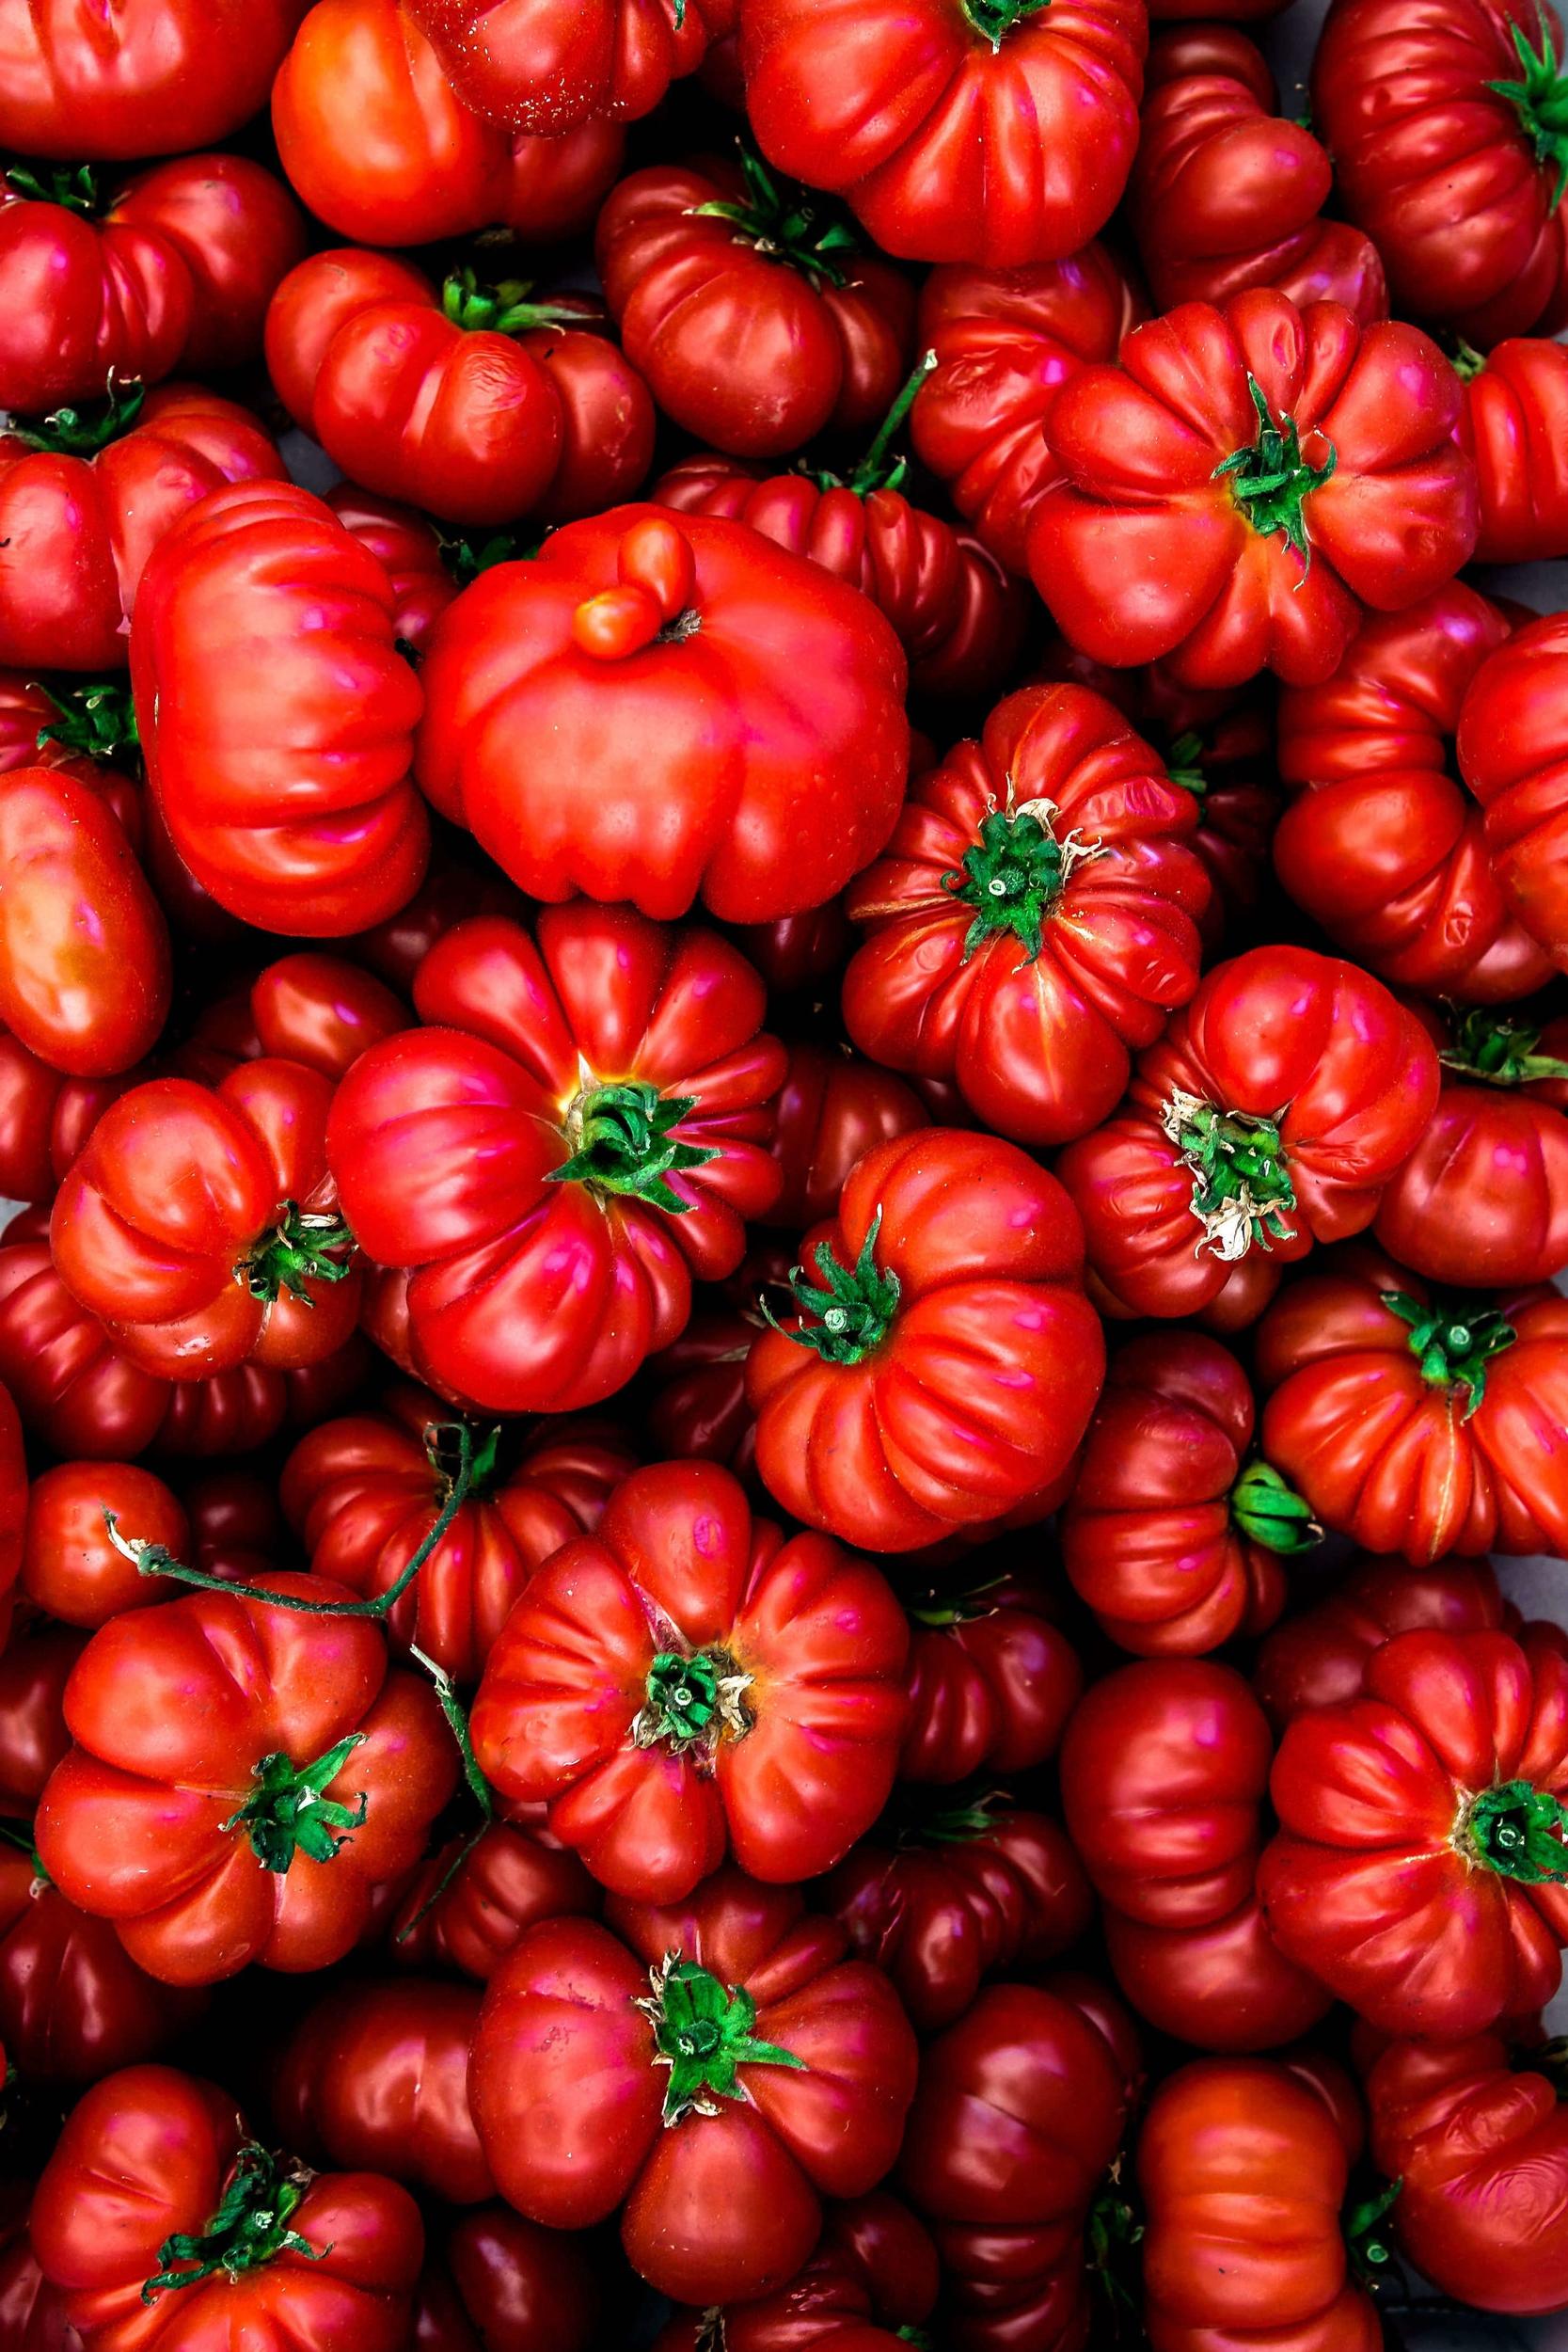 Siforellana_tomatoes.jpg